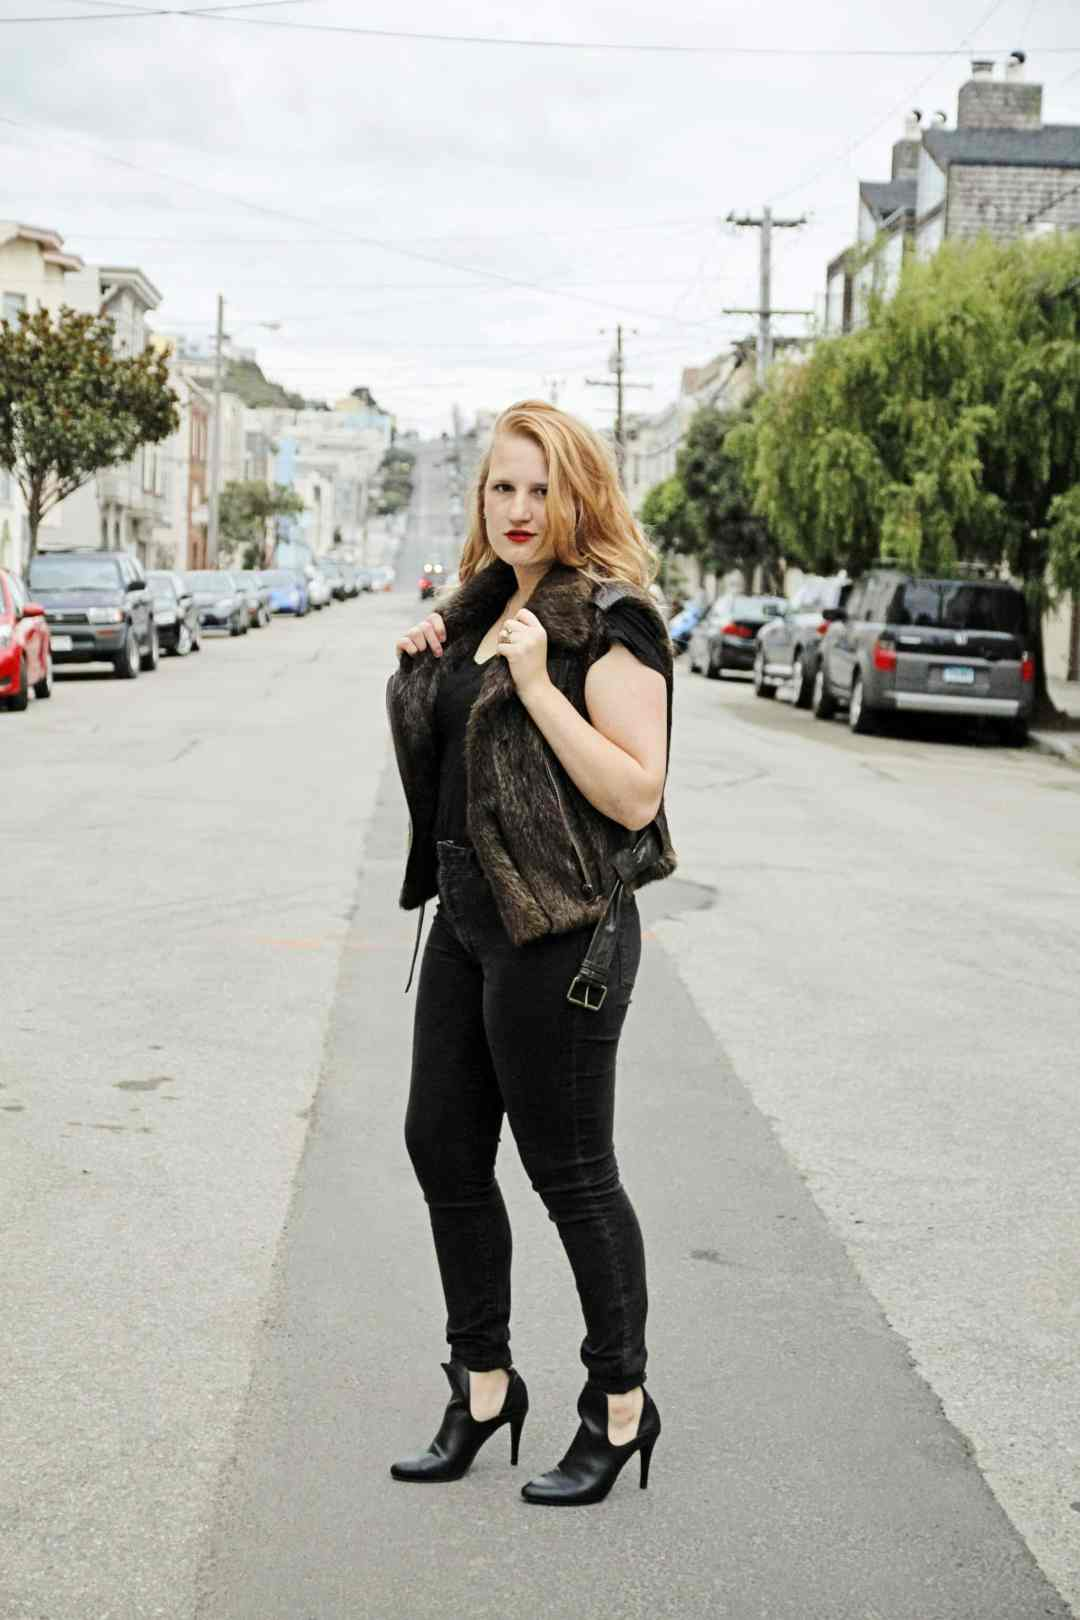 plus size fashion blog, plus size fashion, curvy fashion, san francisco fashion blog